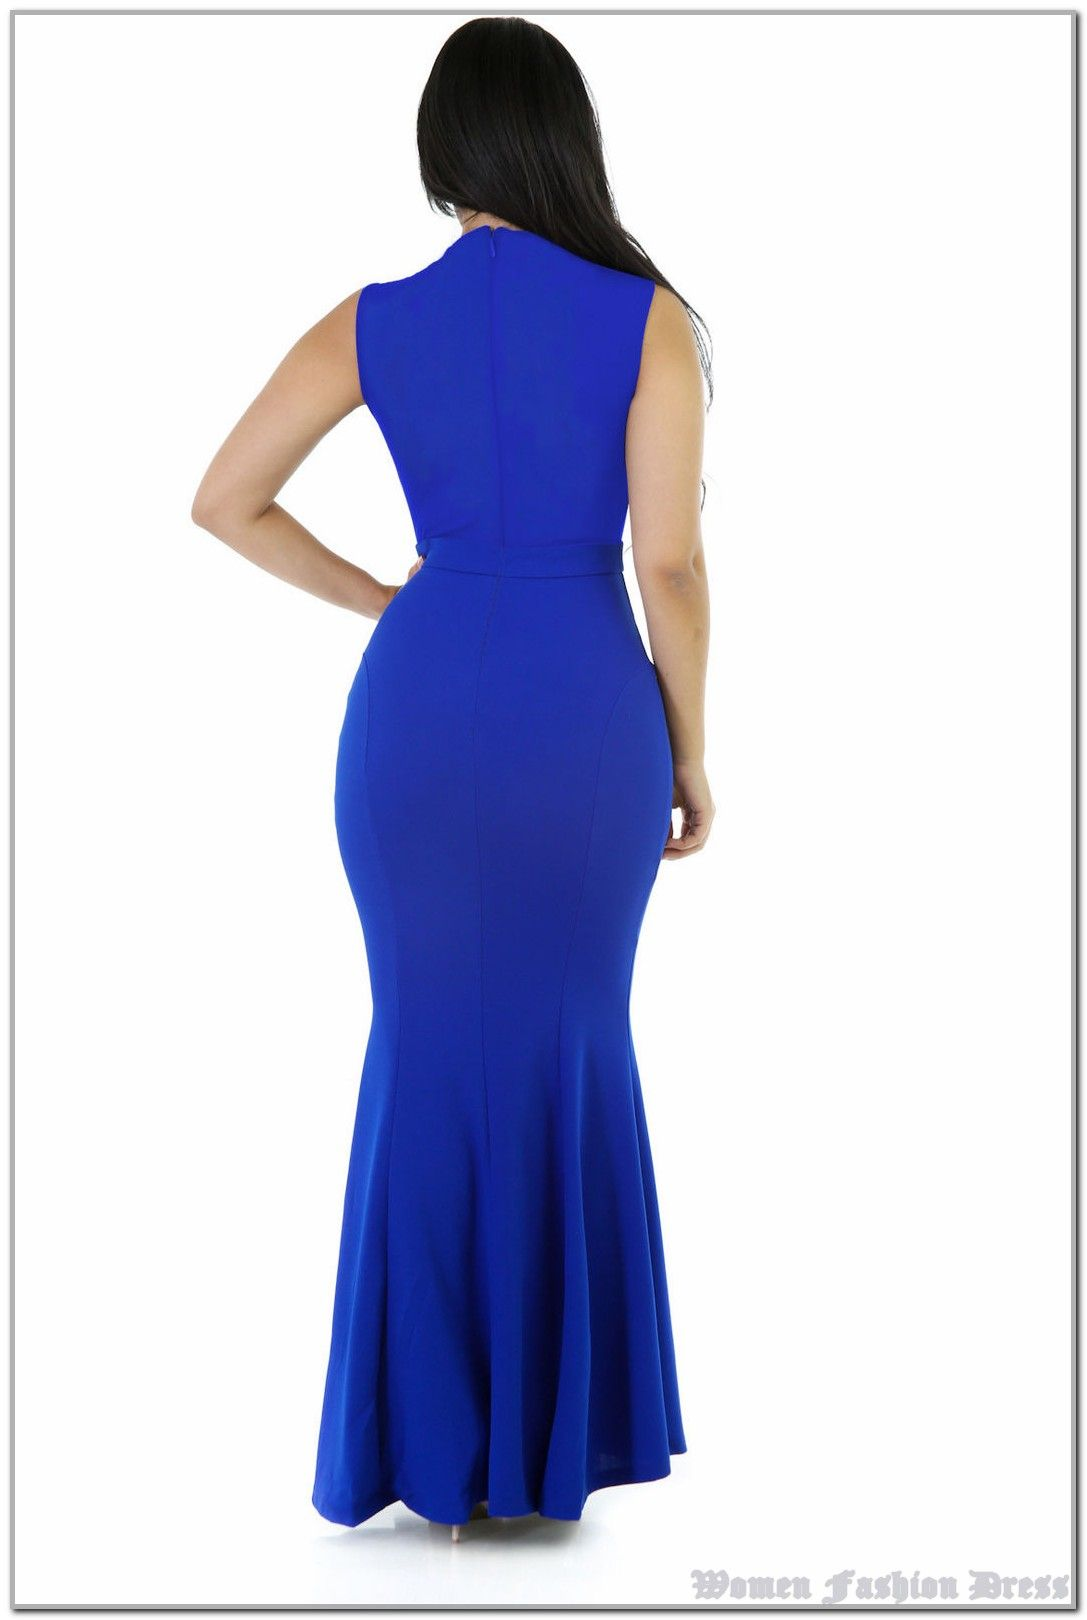 Seductive Women Fashion Dress